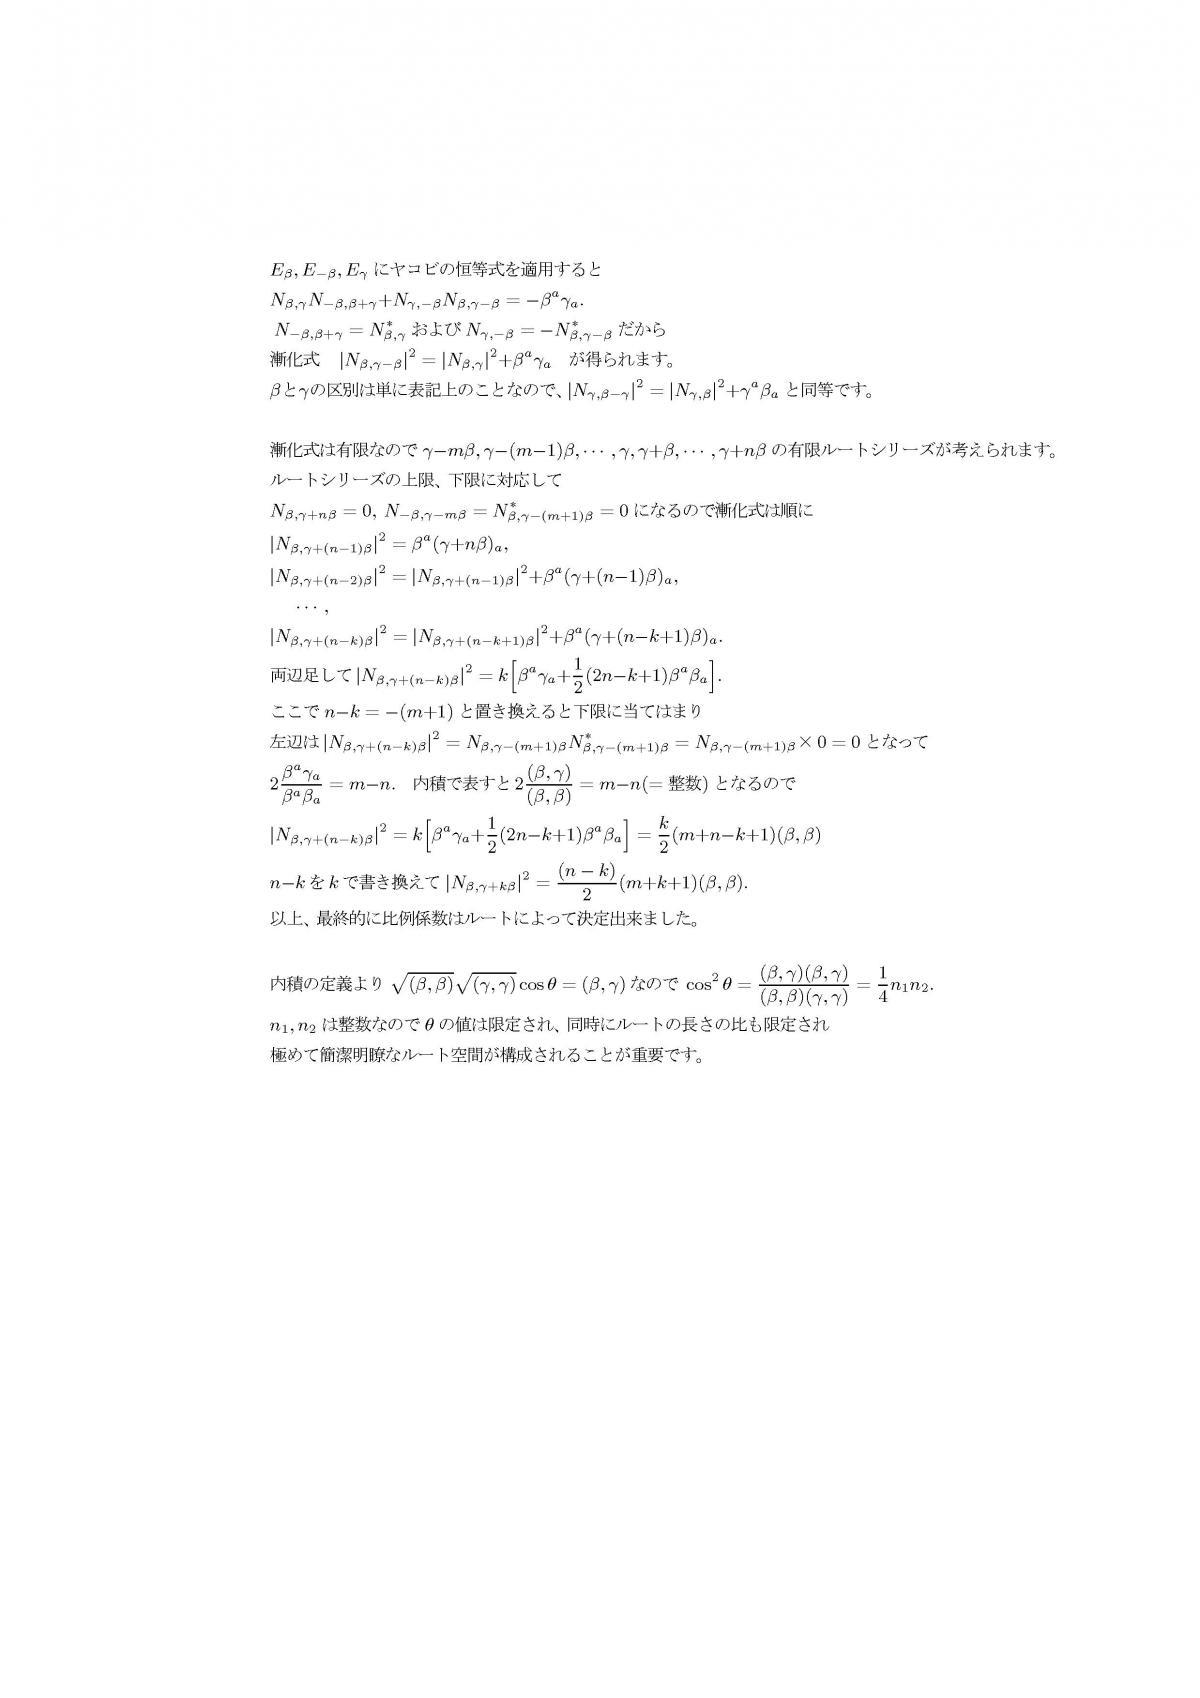 grp130813b.jpg